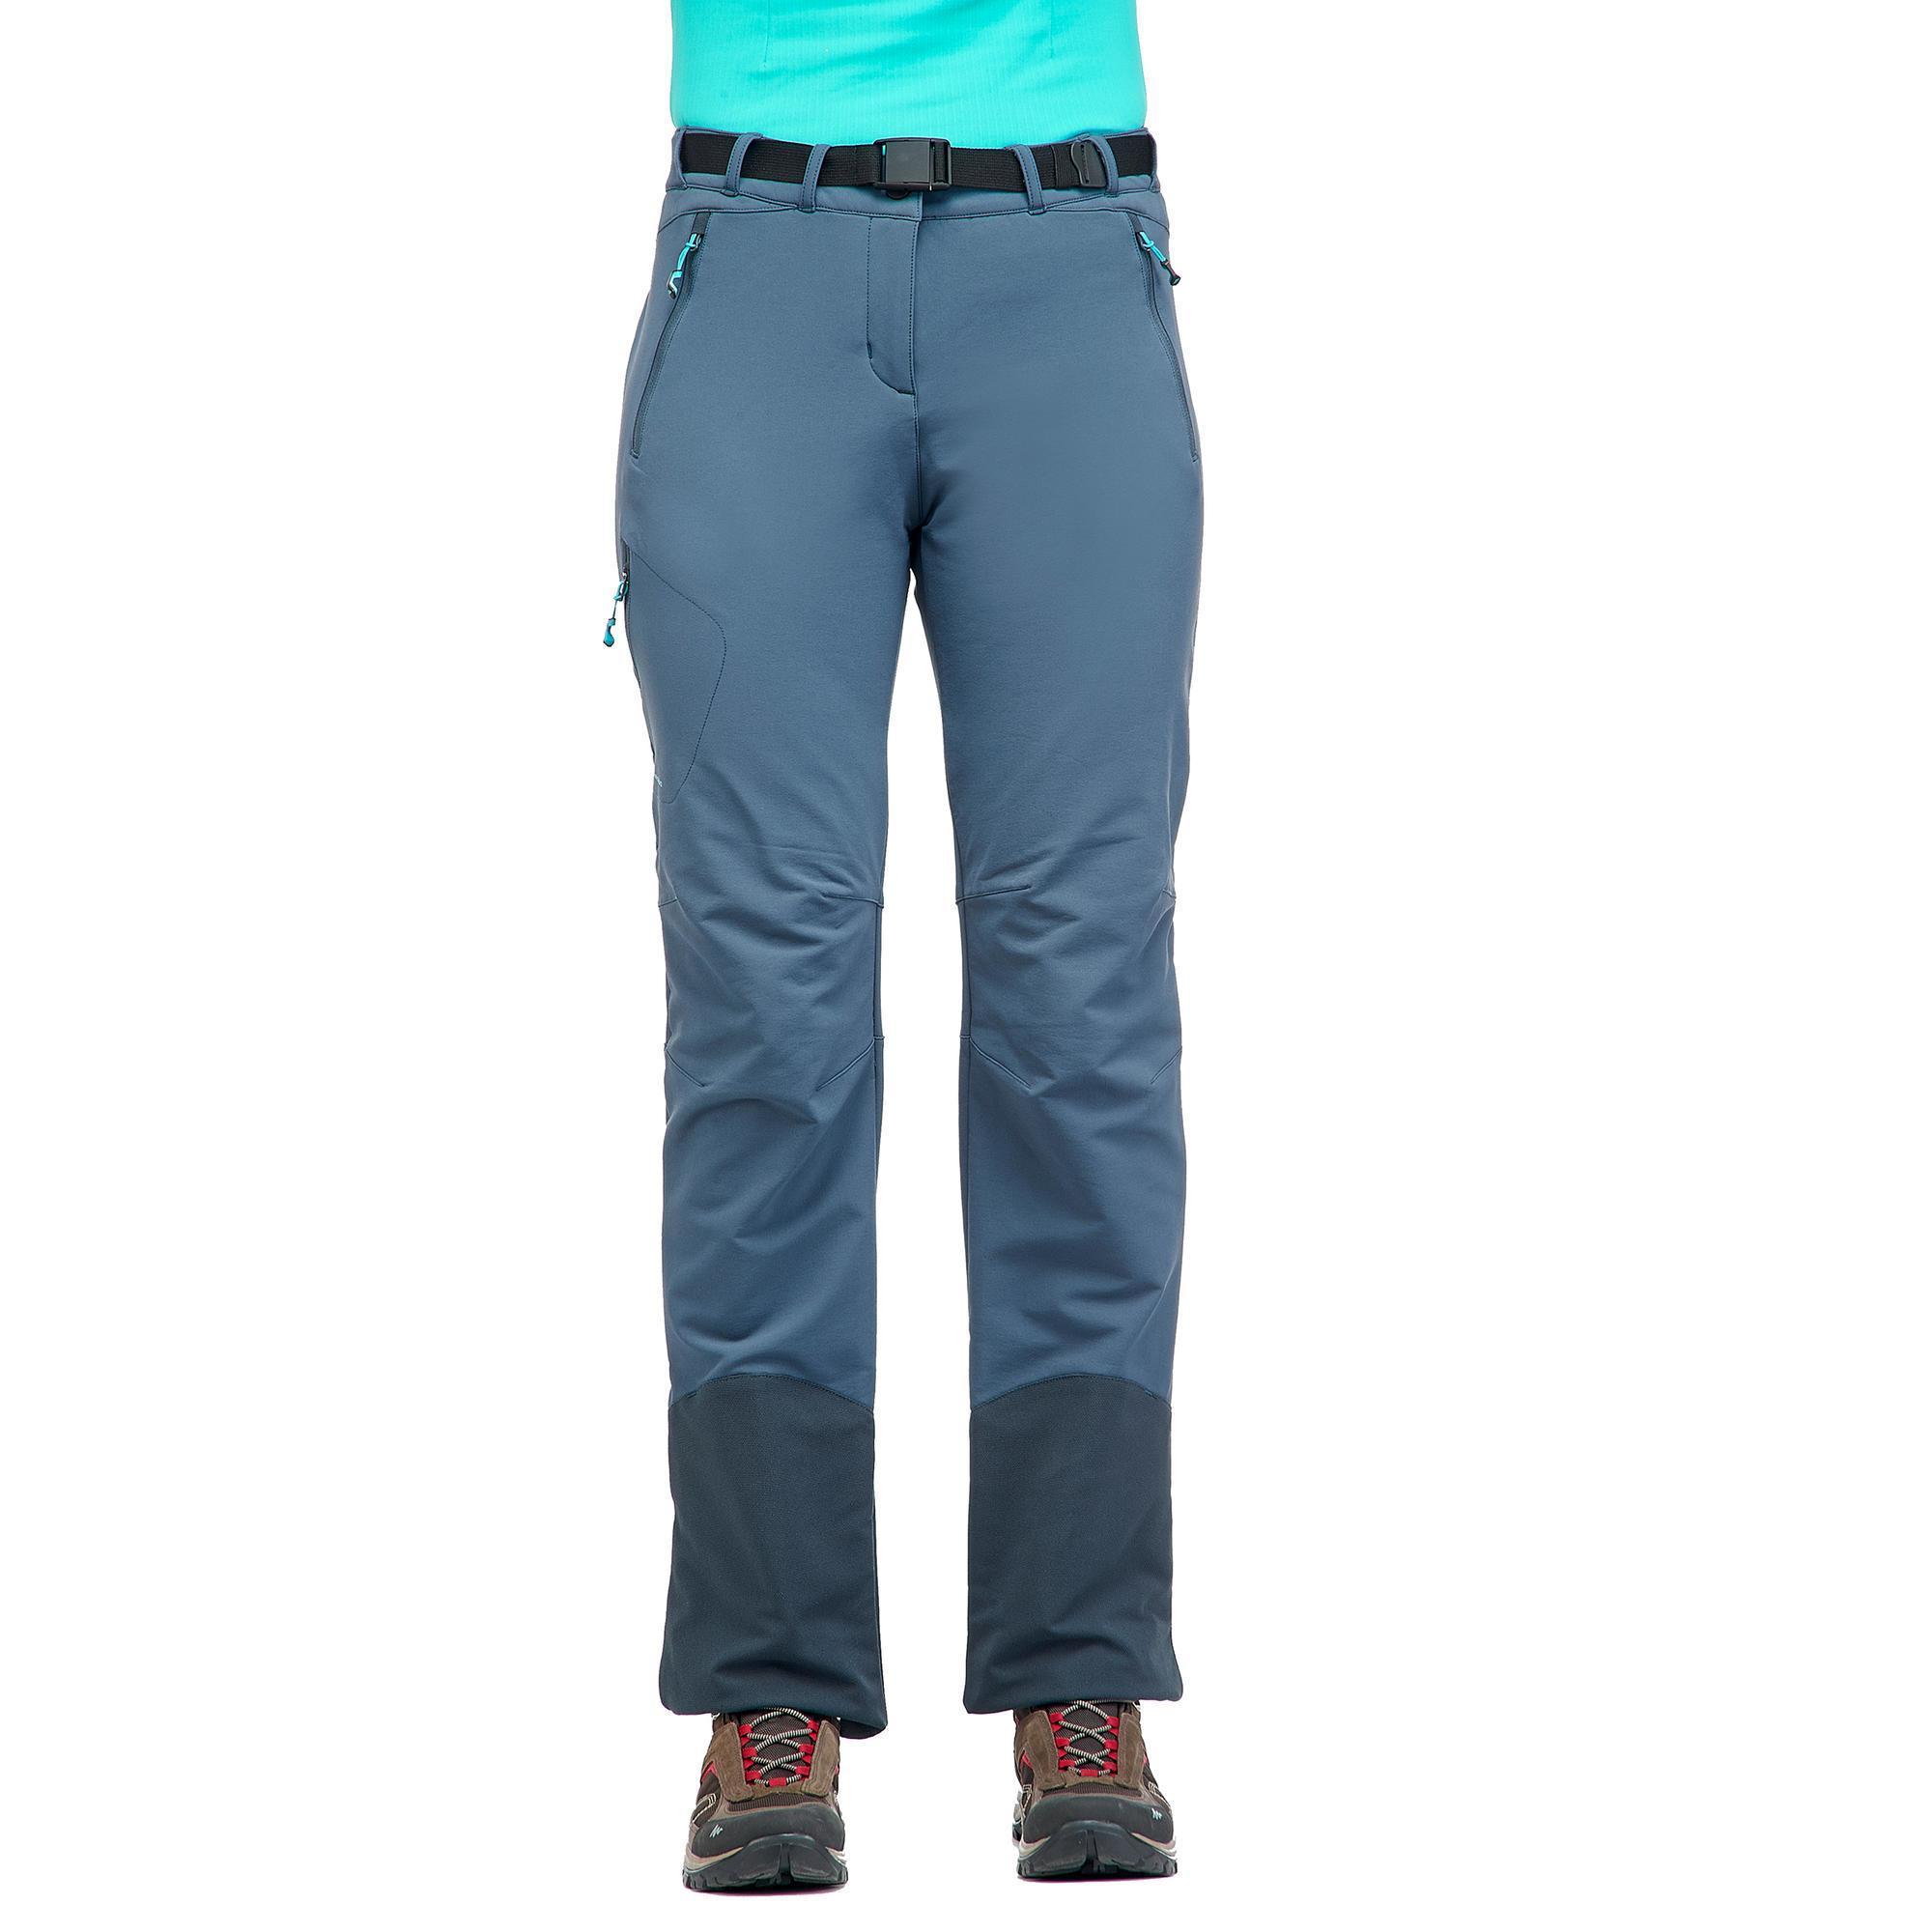 Pantalón stretch azul warm SH500 de china x nieve senderismo mujer wHUFwqOC 02f4d940798